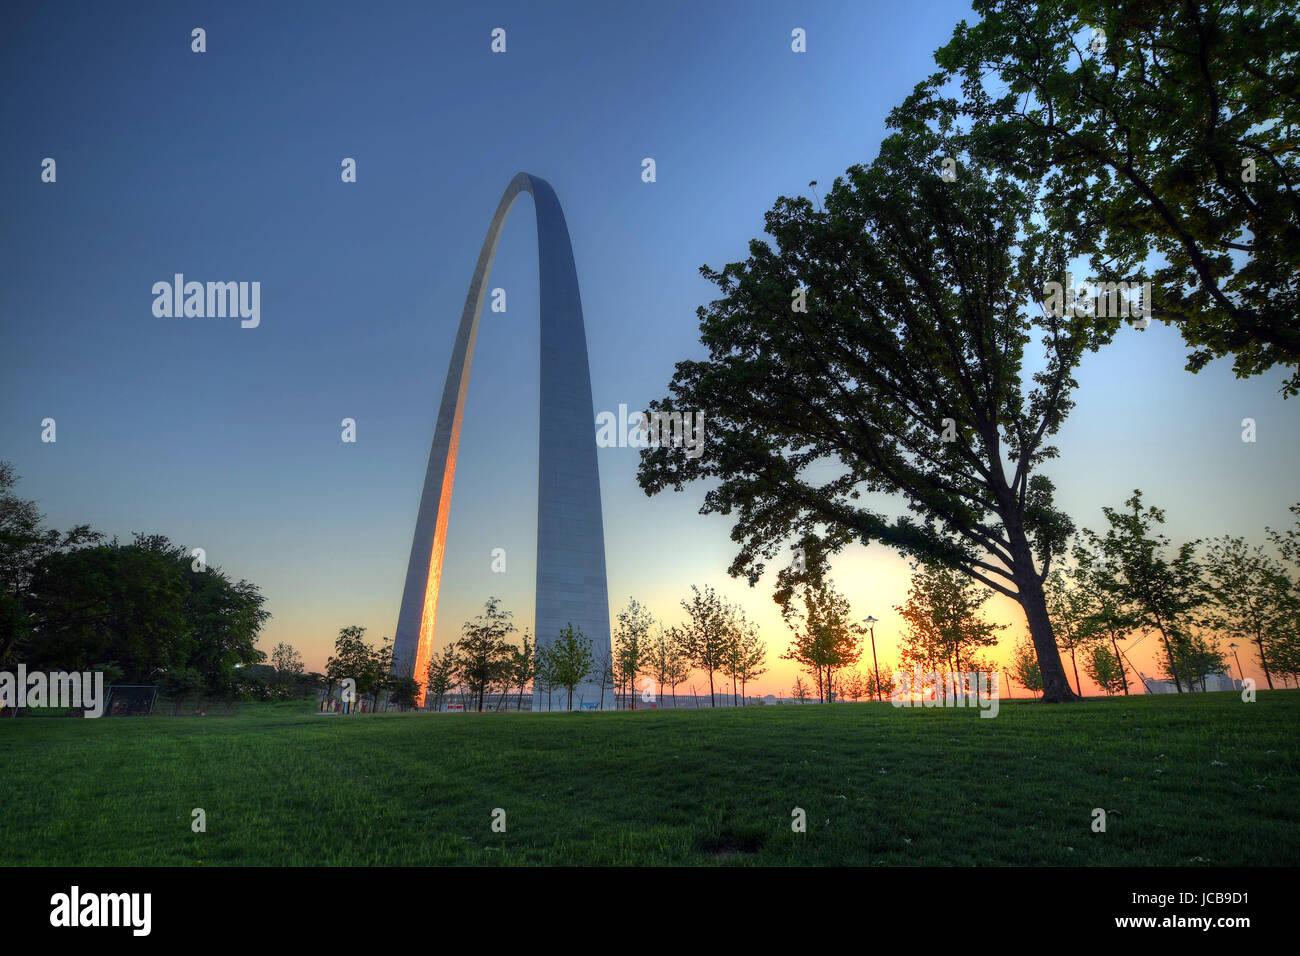 Gateway Arch in St. Louis, Missouri. - Stock Image